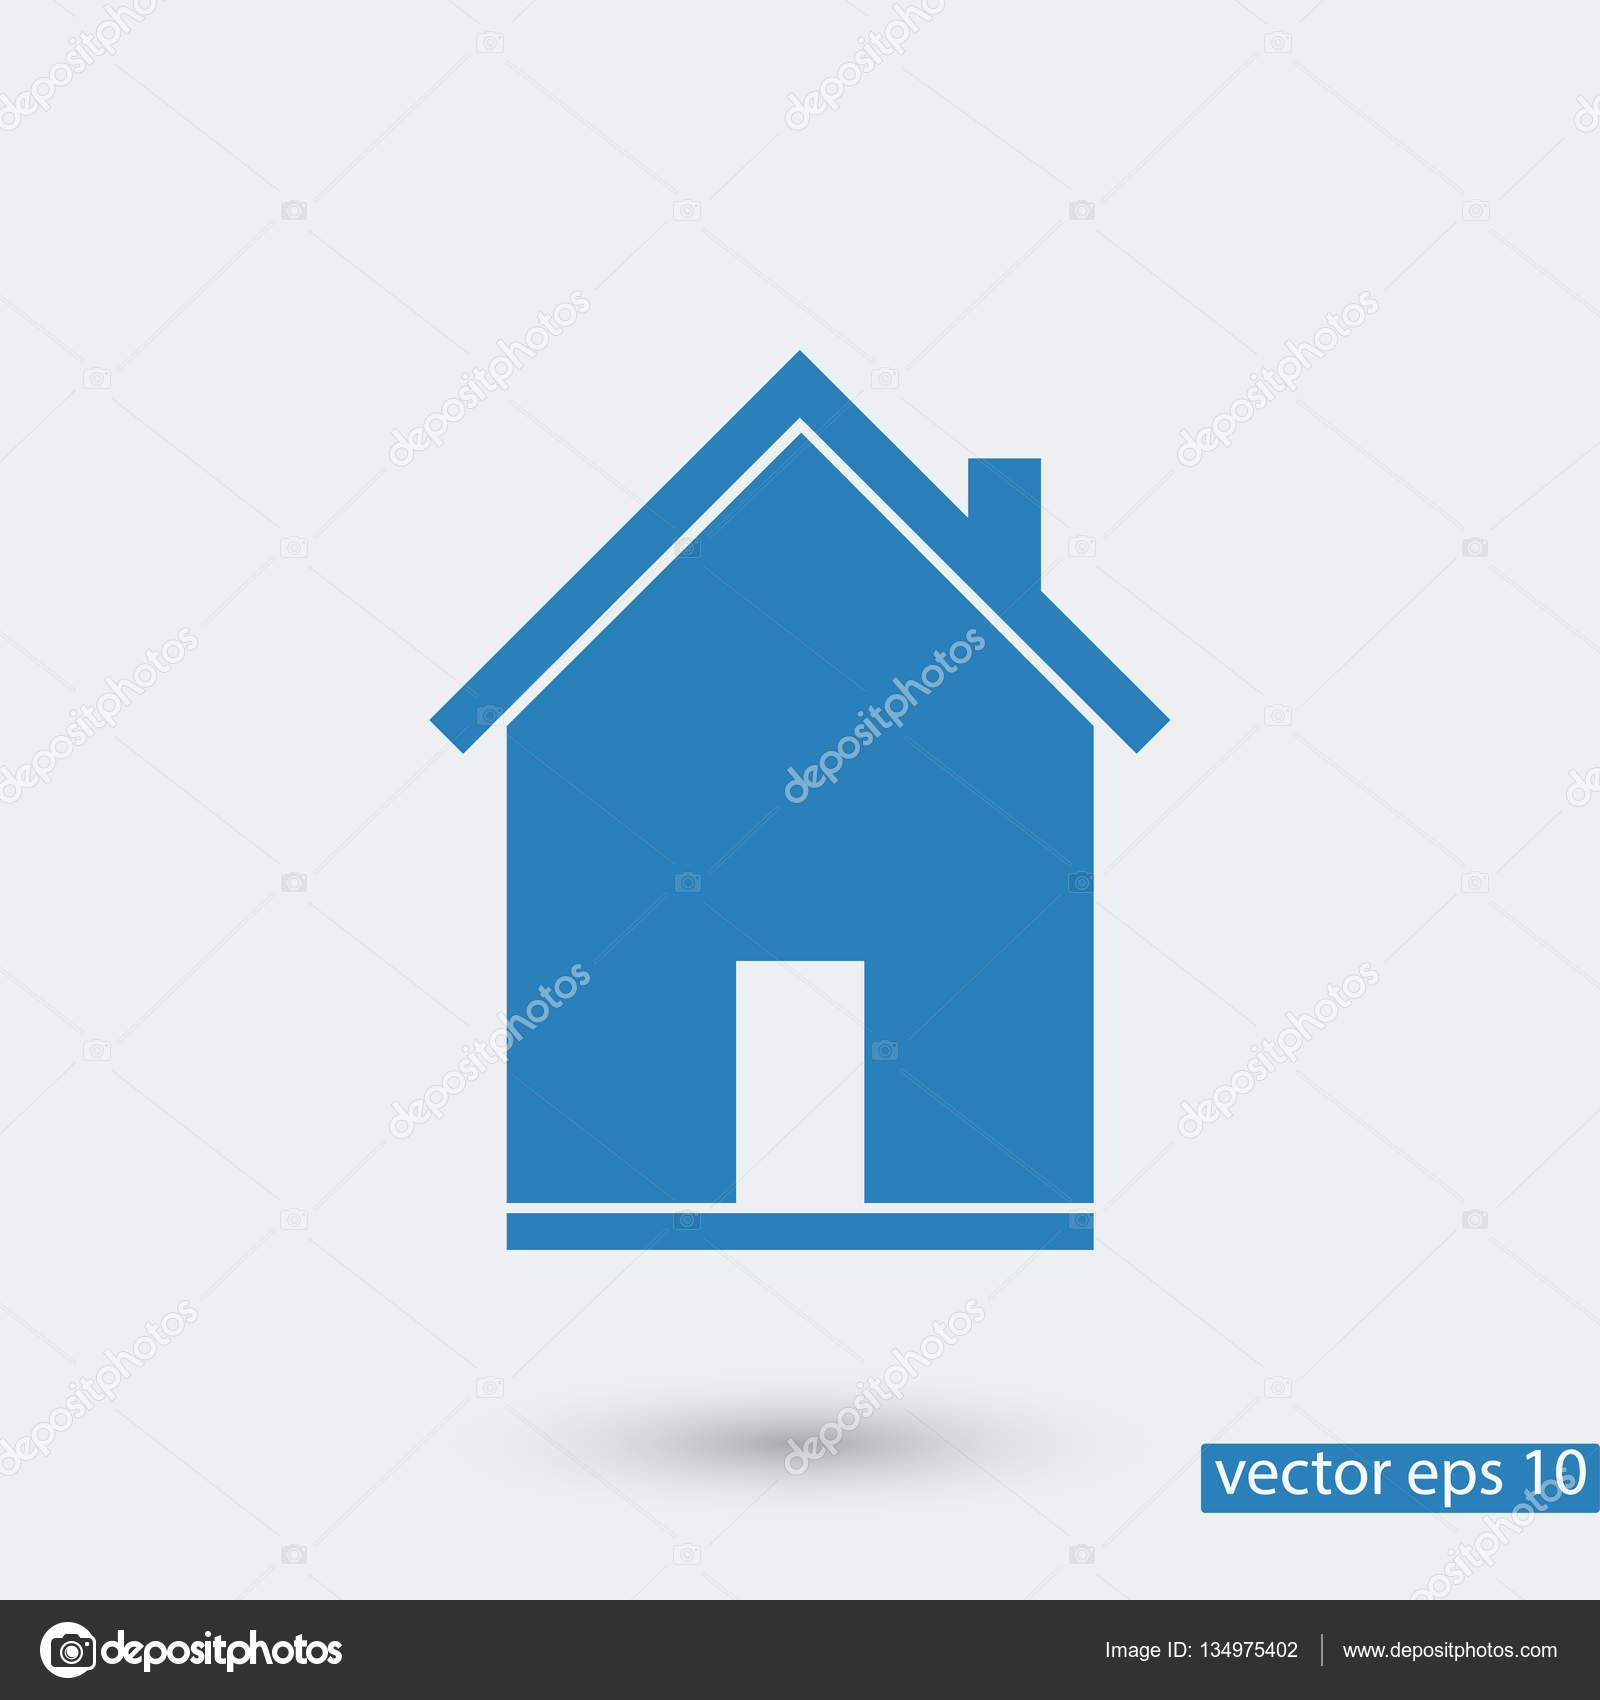 home simple icon — Stock Vector © SimVA #134975402